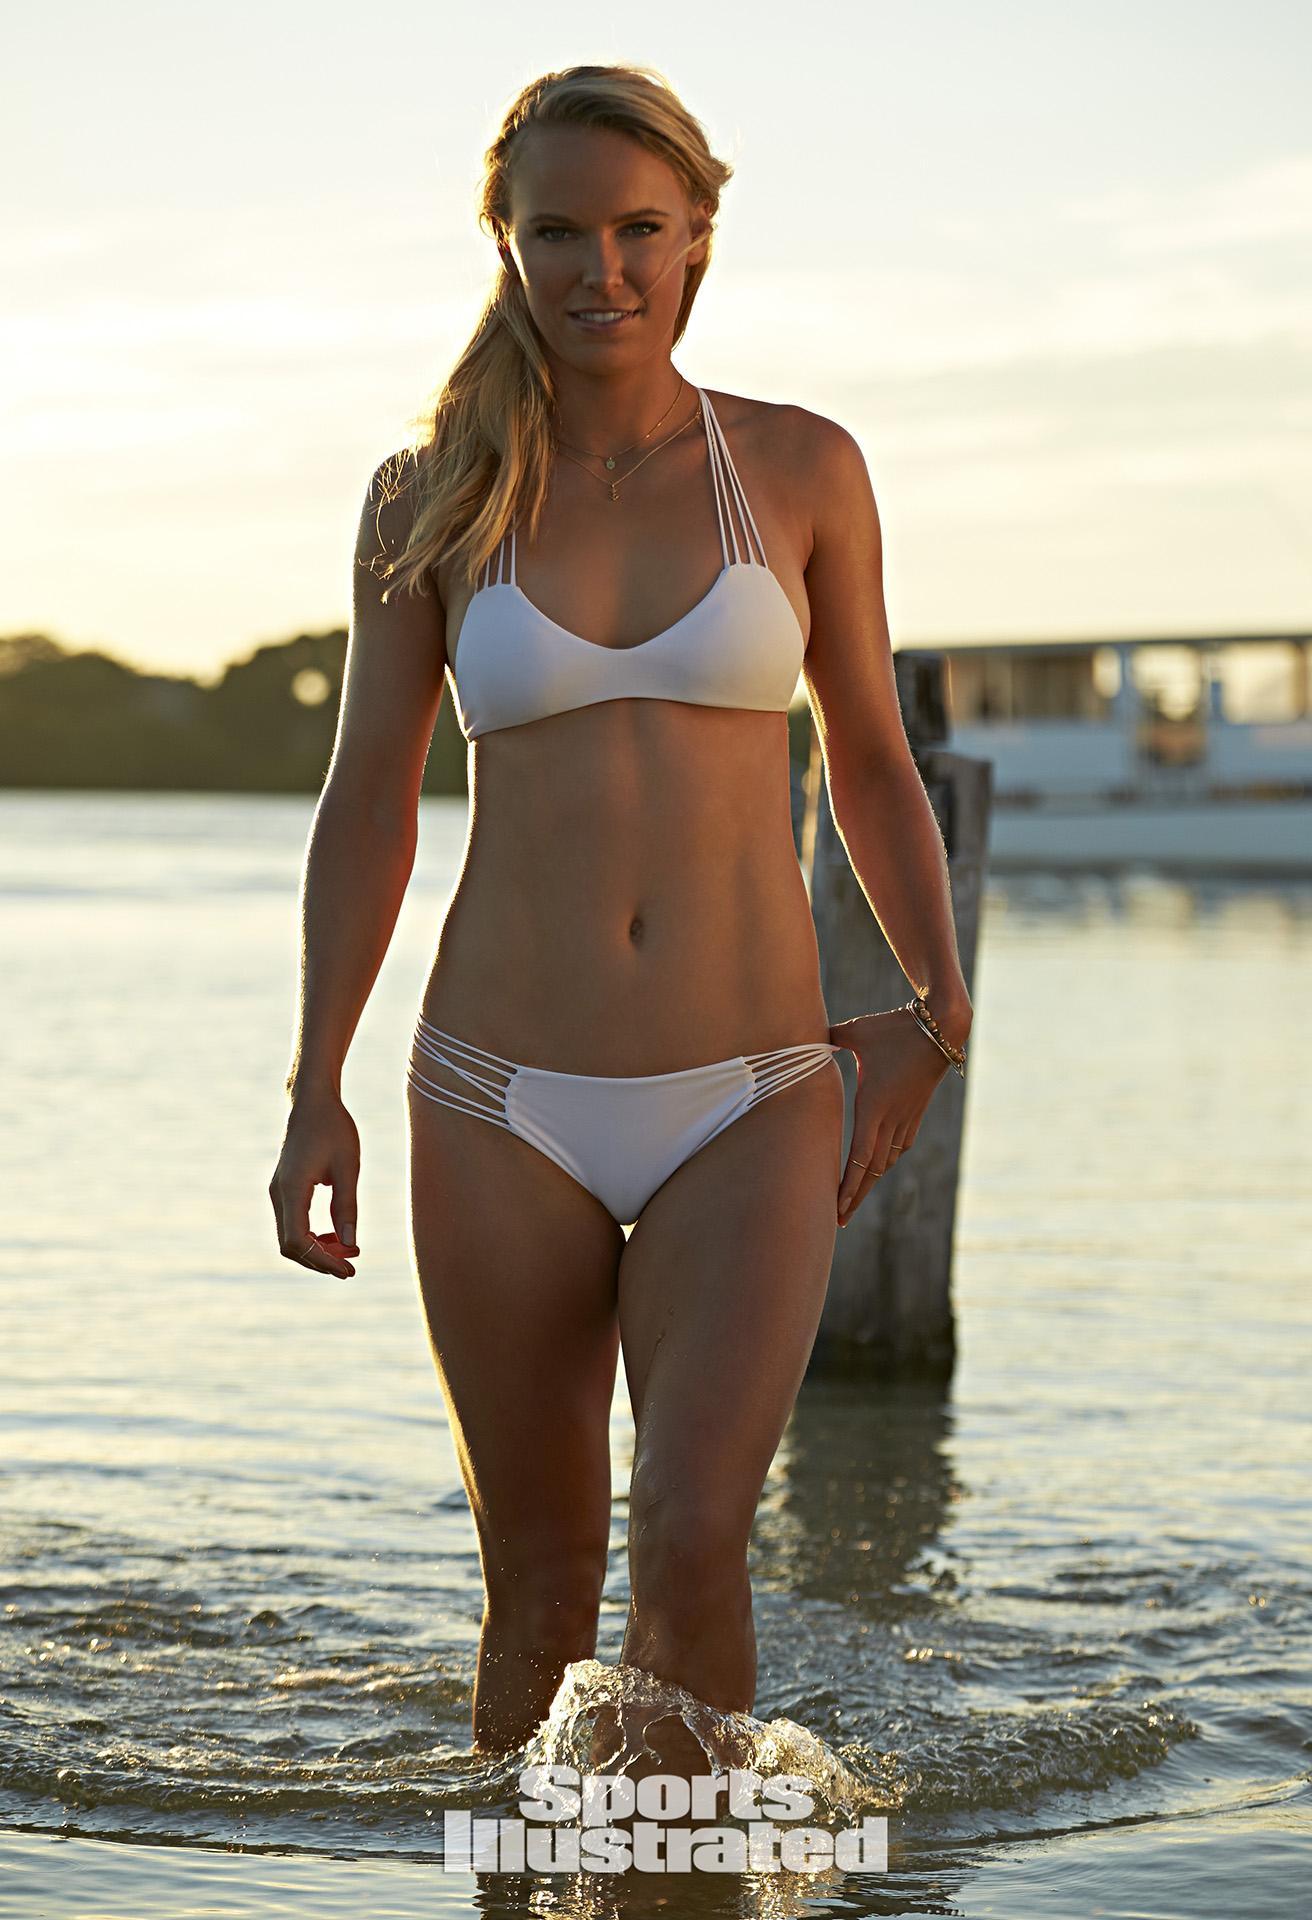 Caroline Wozniacki Swimsuit Photos, Sports Illustrated ...